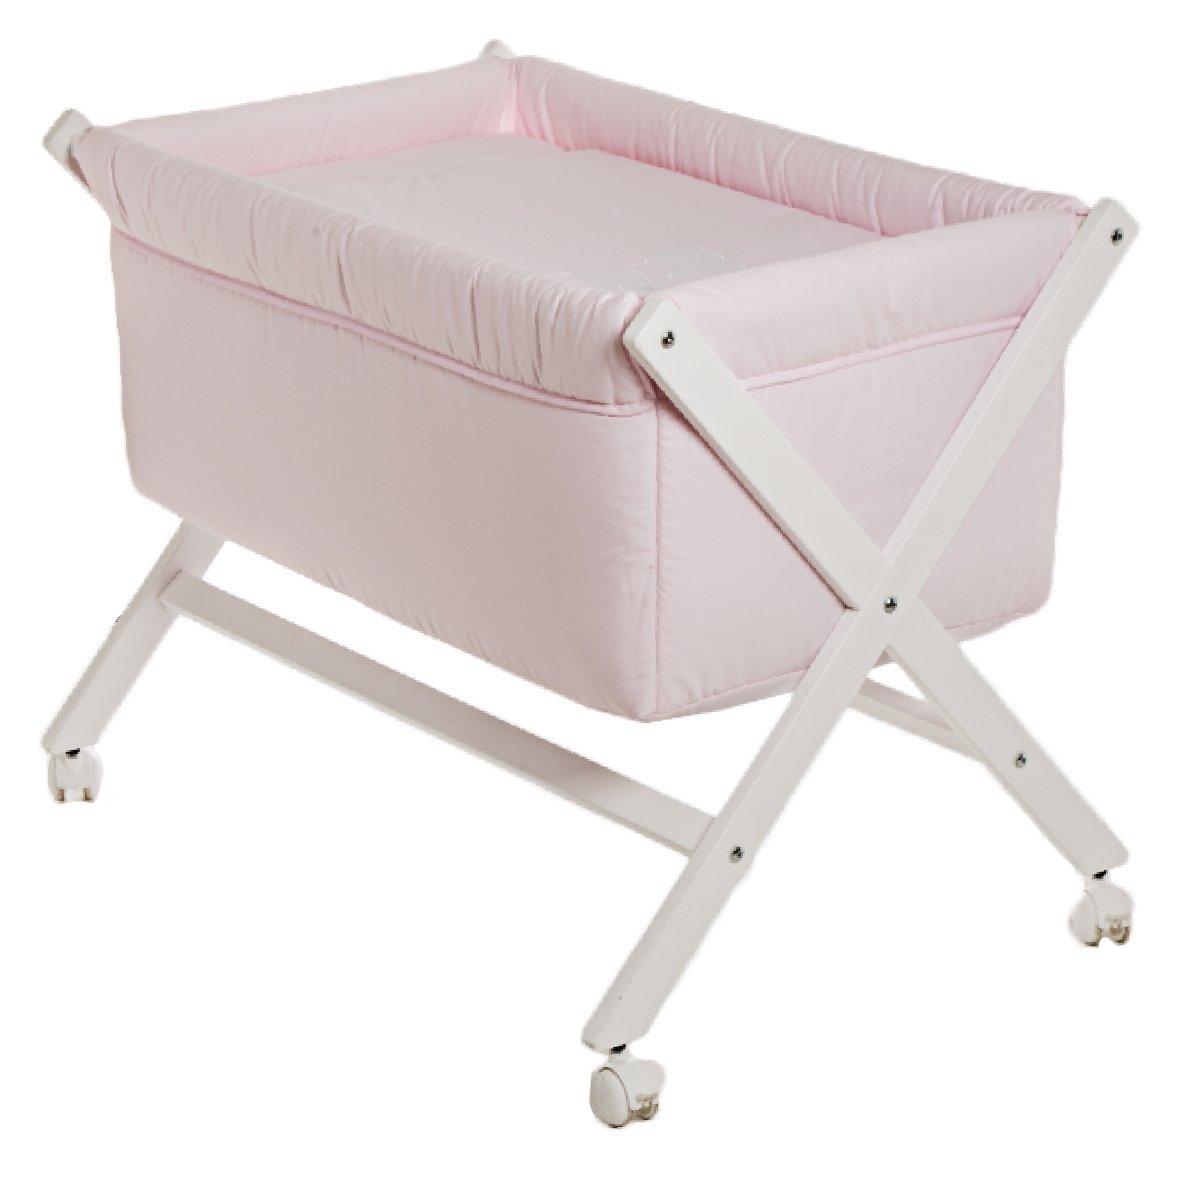 Cambrass 36342 Babybett aus Holz X-Form, 55 x 87 x 74 cm, classic rosa günstig online kaufen